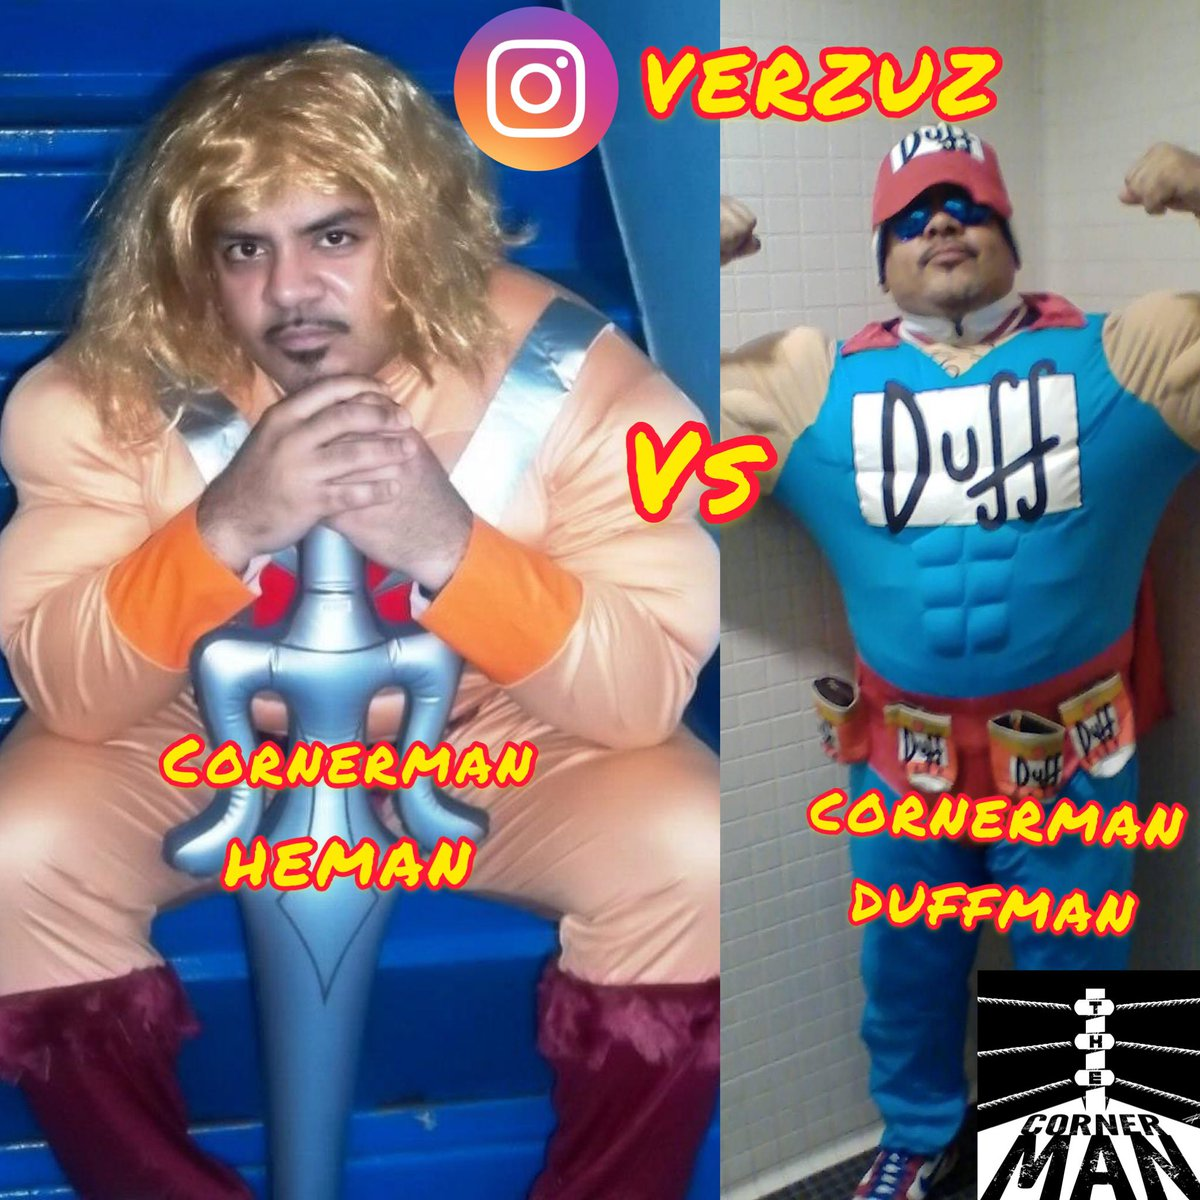 The most talked about #Verzuz #verzuzbattle #instagram ##cornermanhistory #cornerman Cornerman Juan Jeremy #cornermanmotivation #comedy